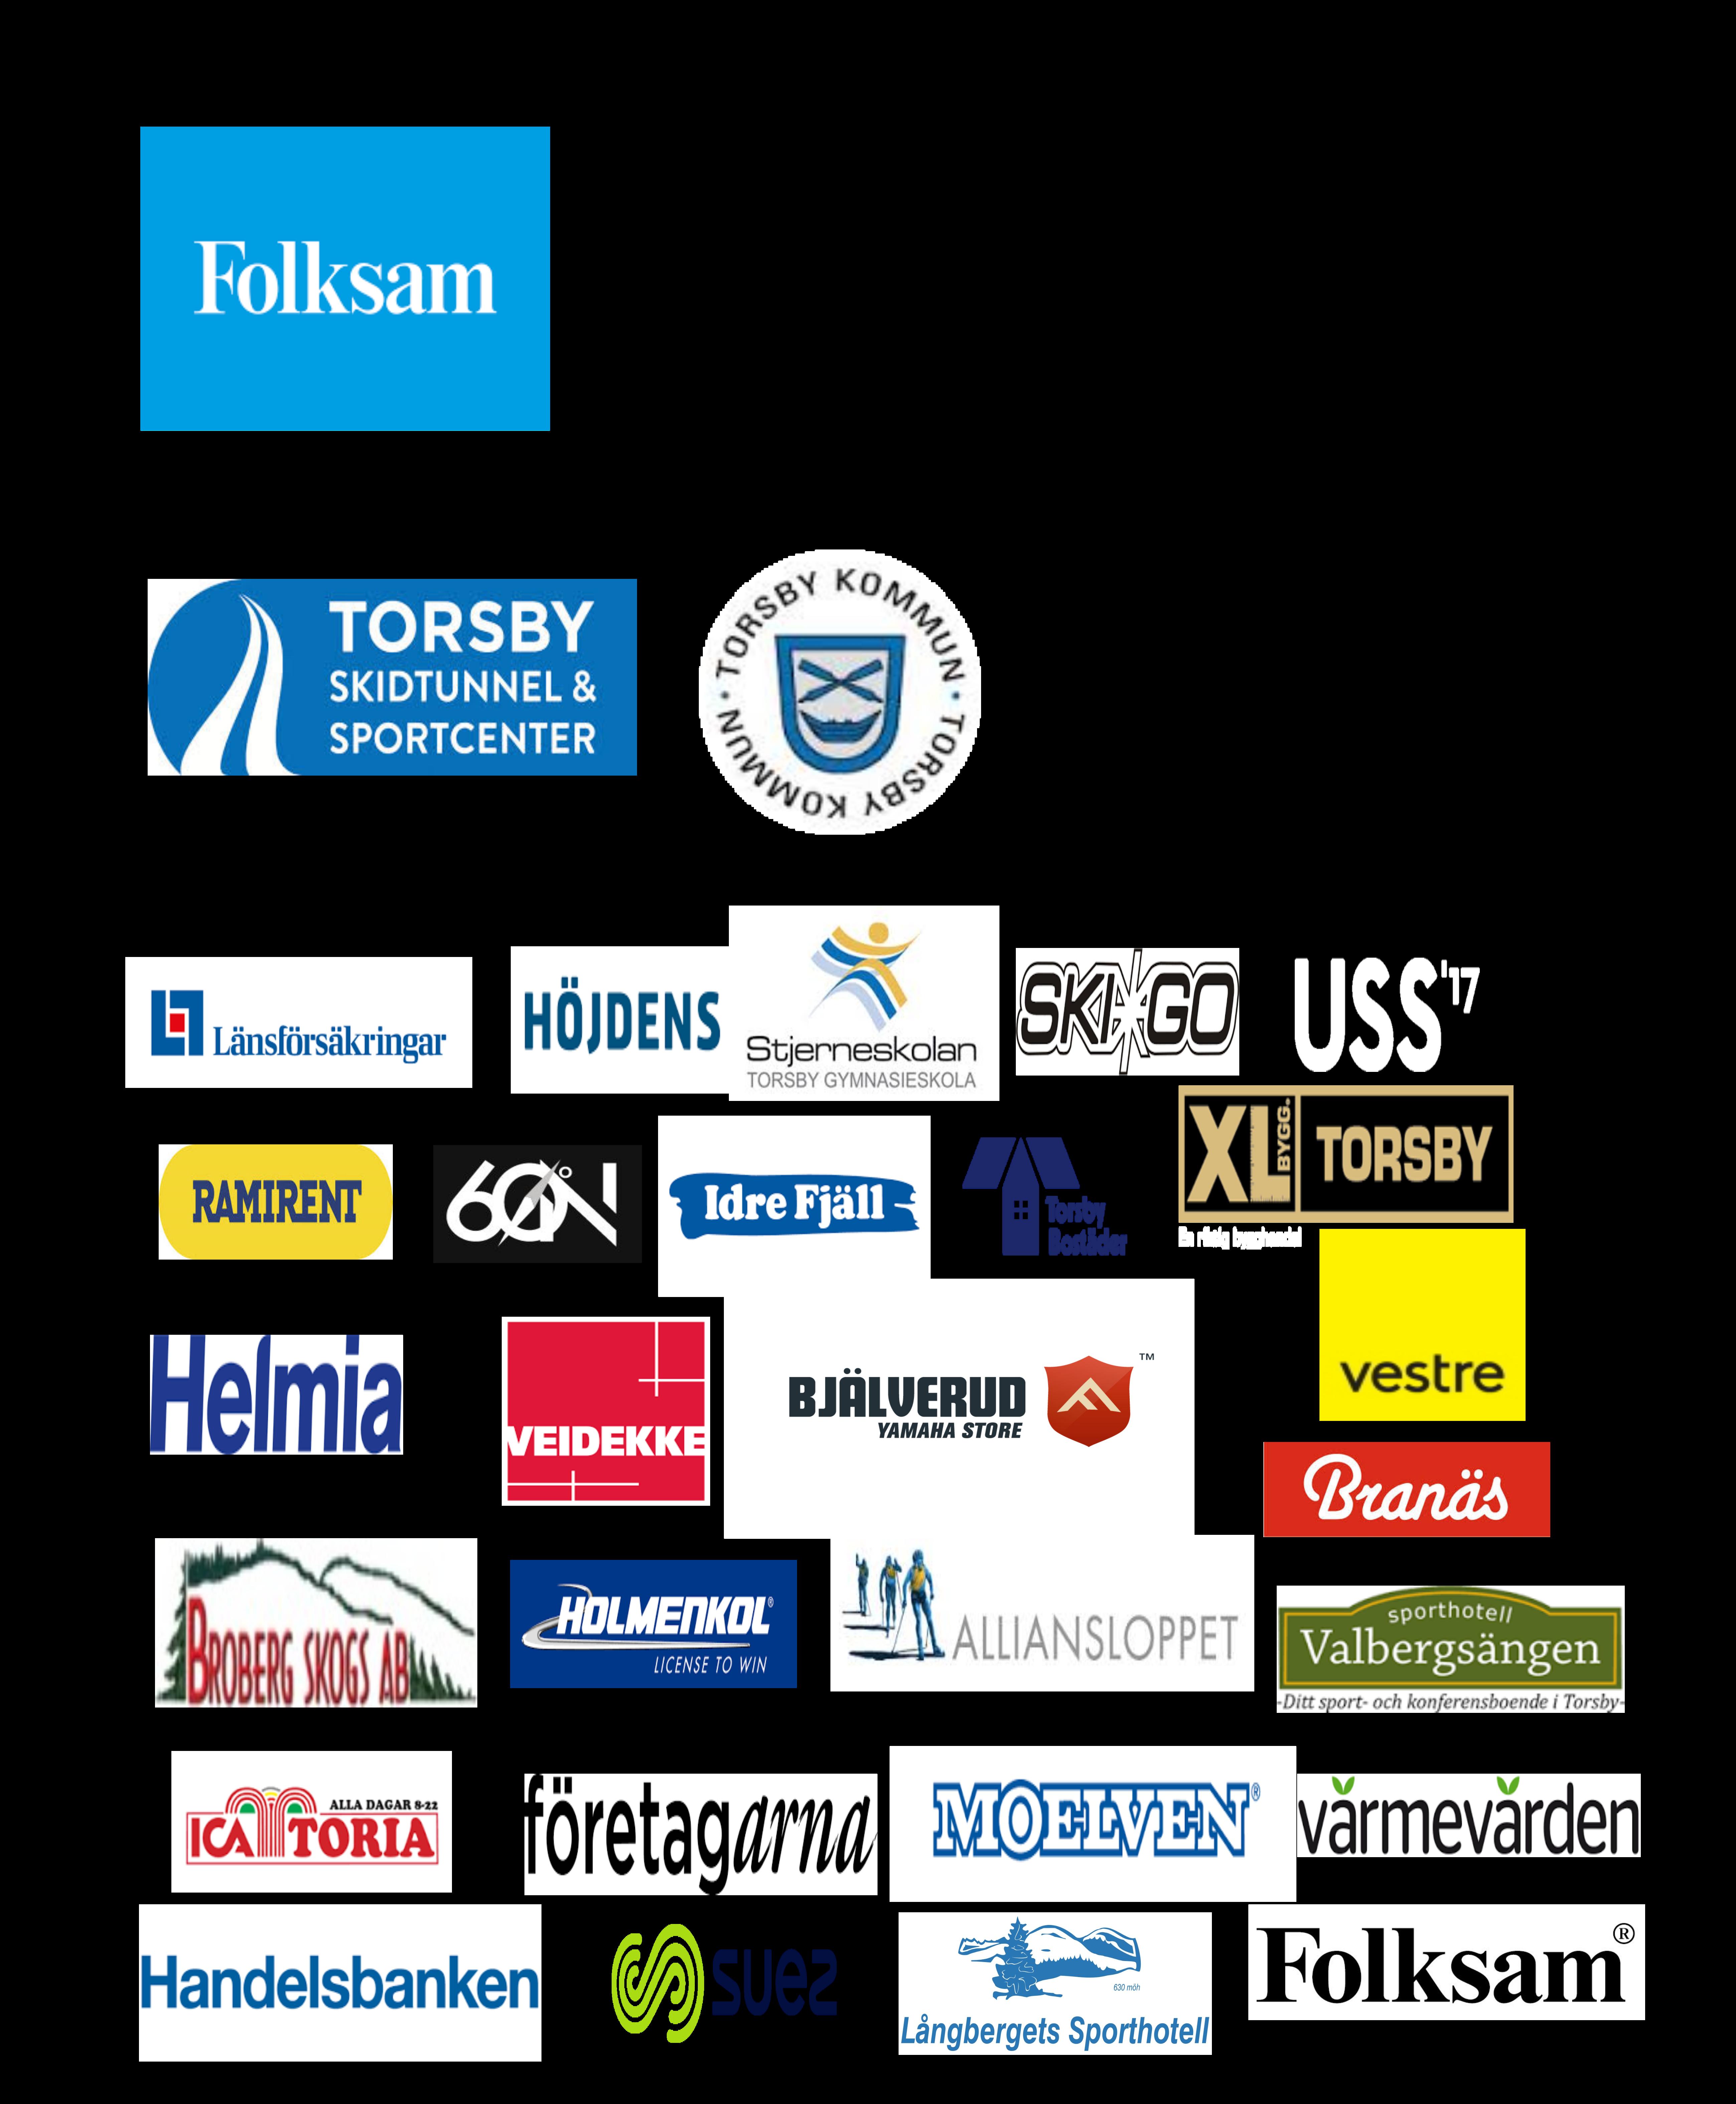 Foklksam sponsorerbild 2018